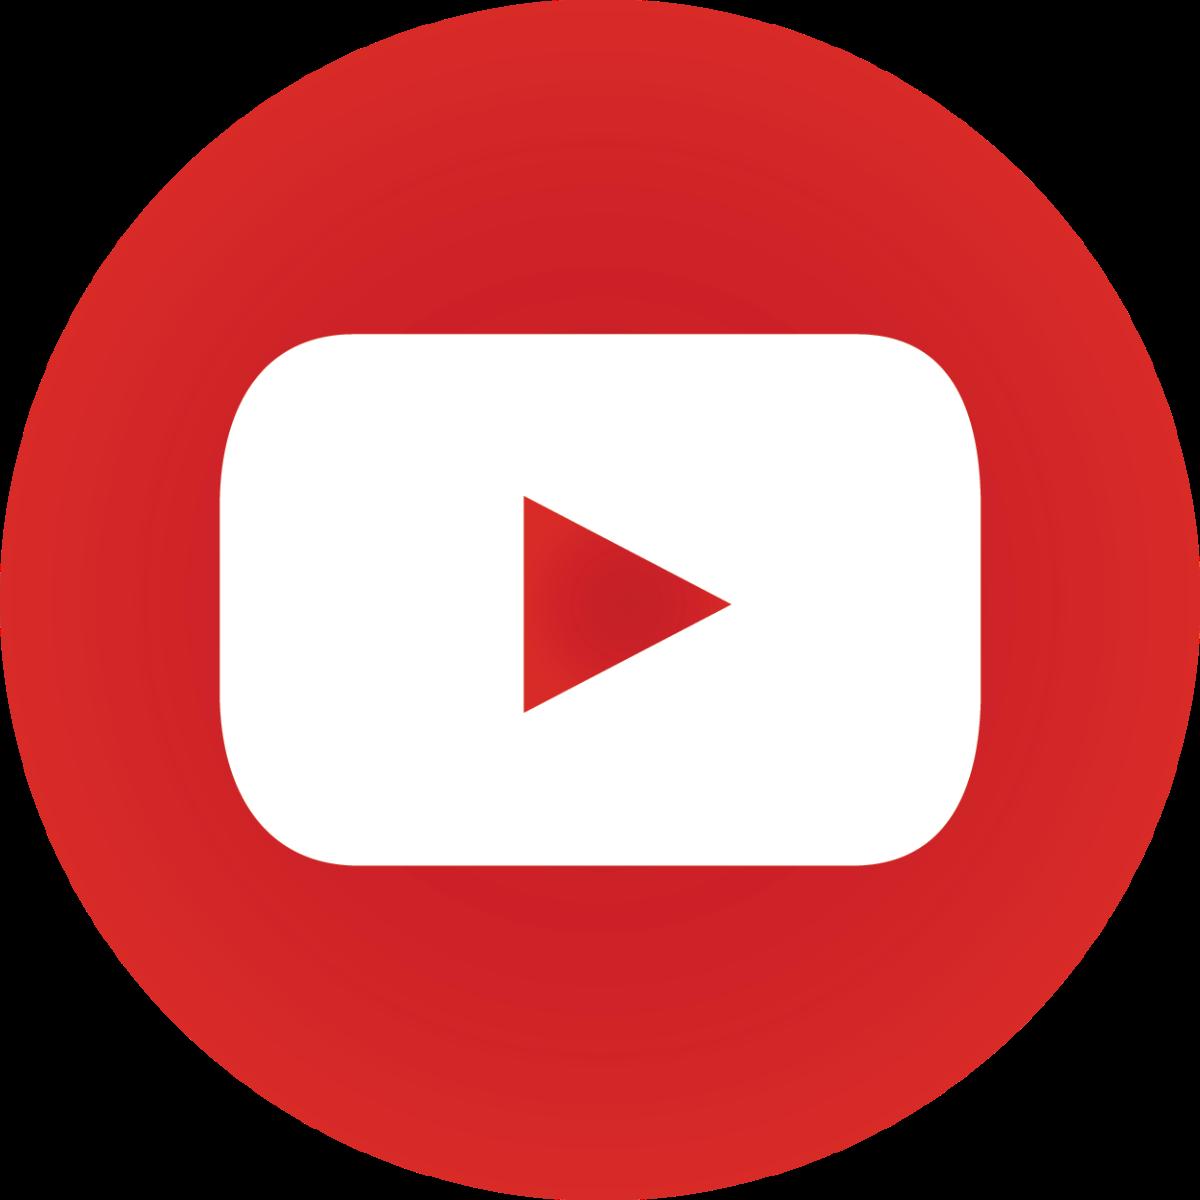 Insignia YouTube